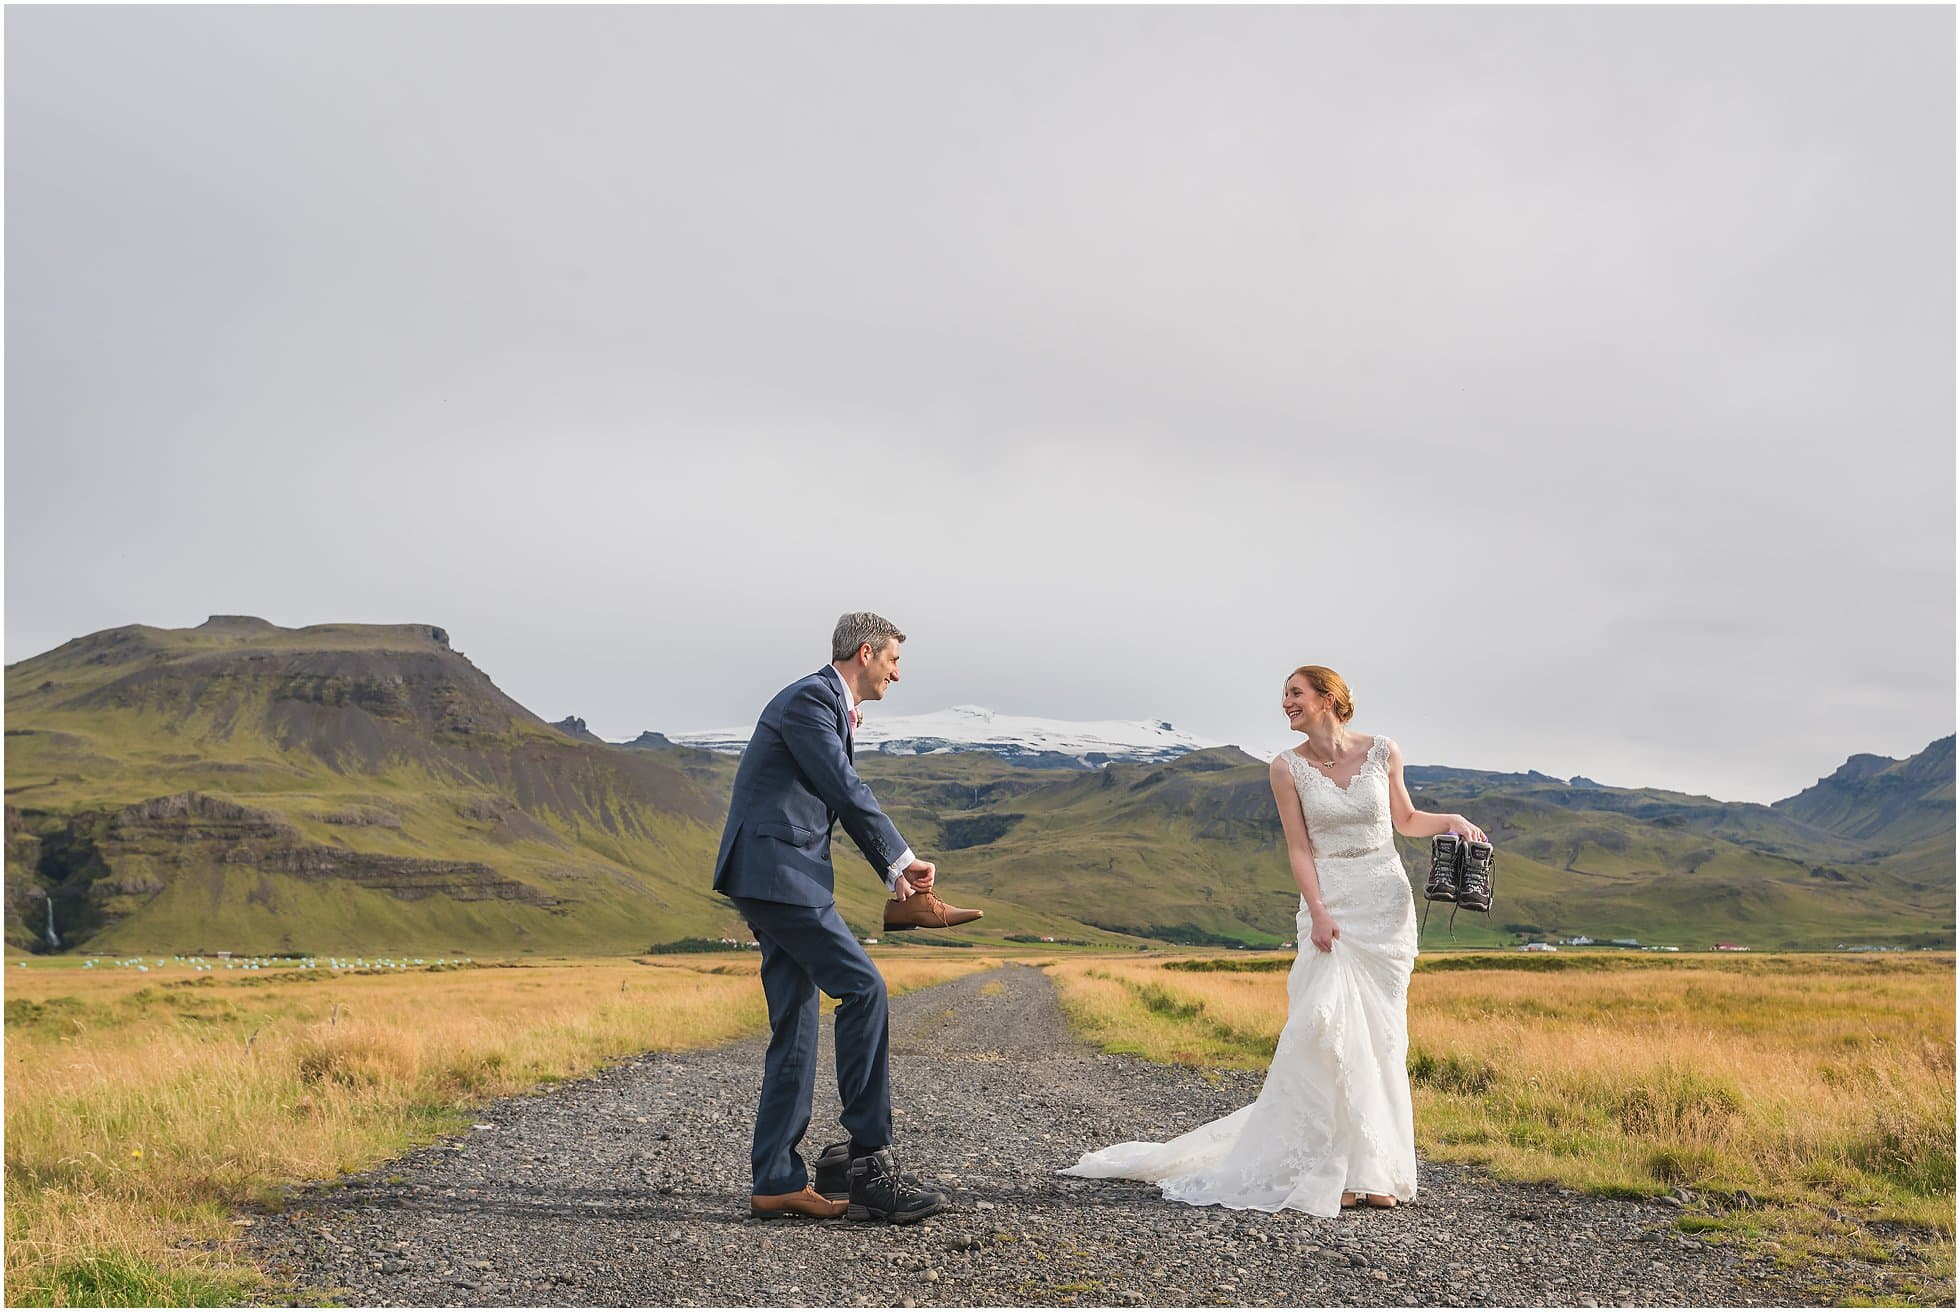 Relaxed iceland wedding photography